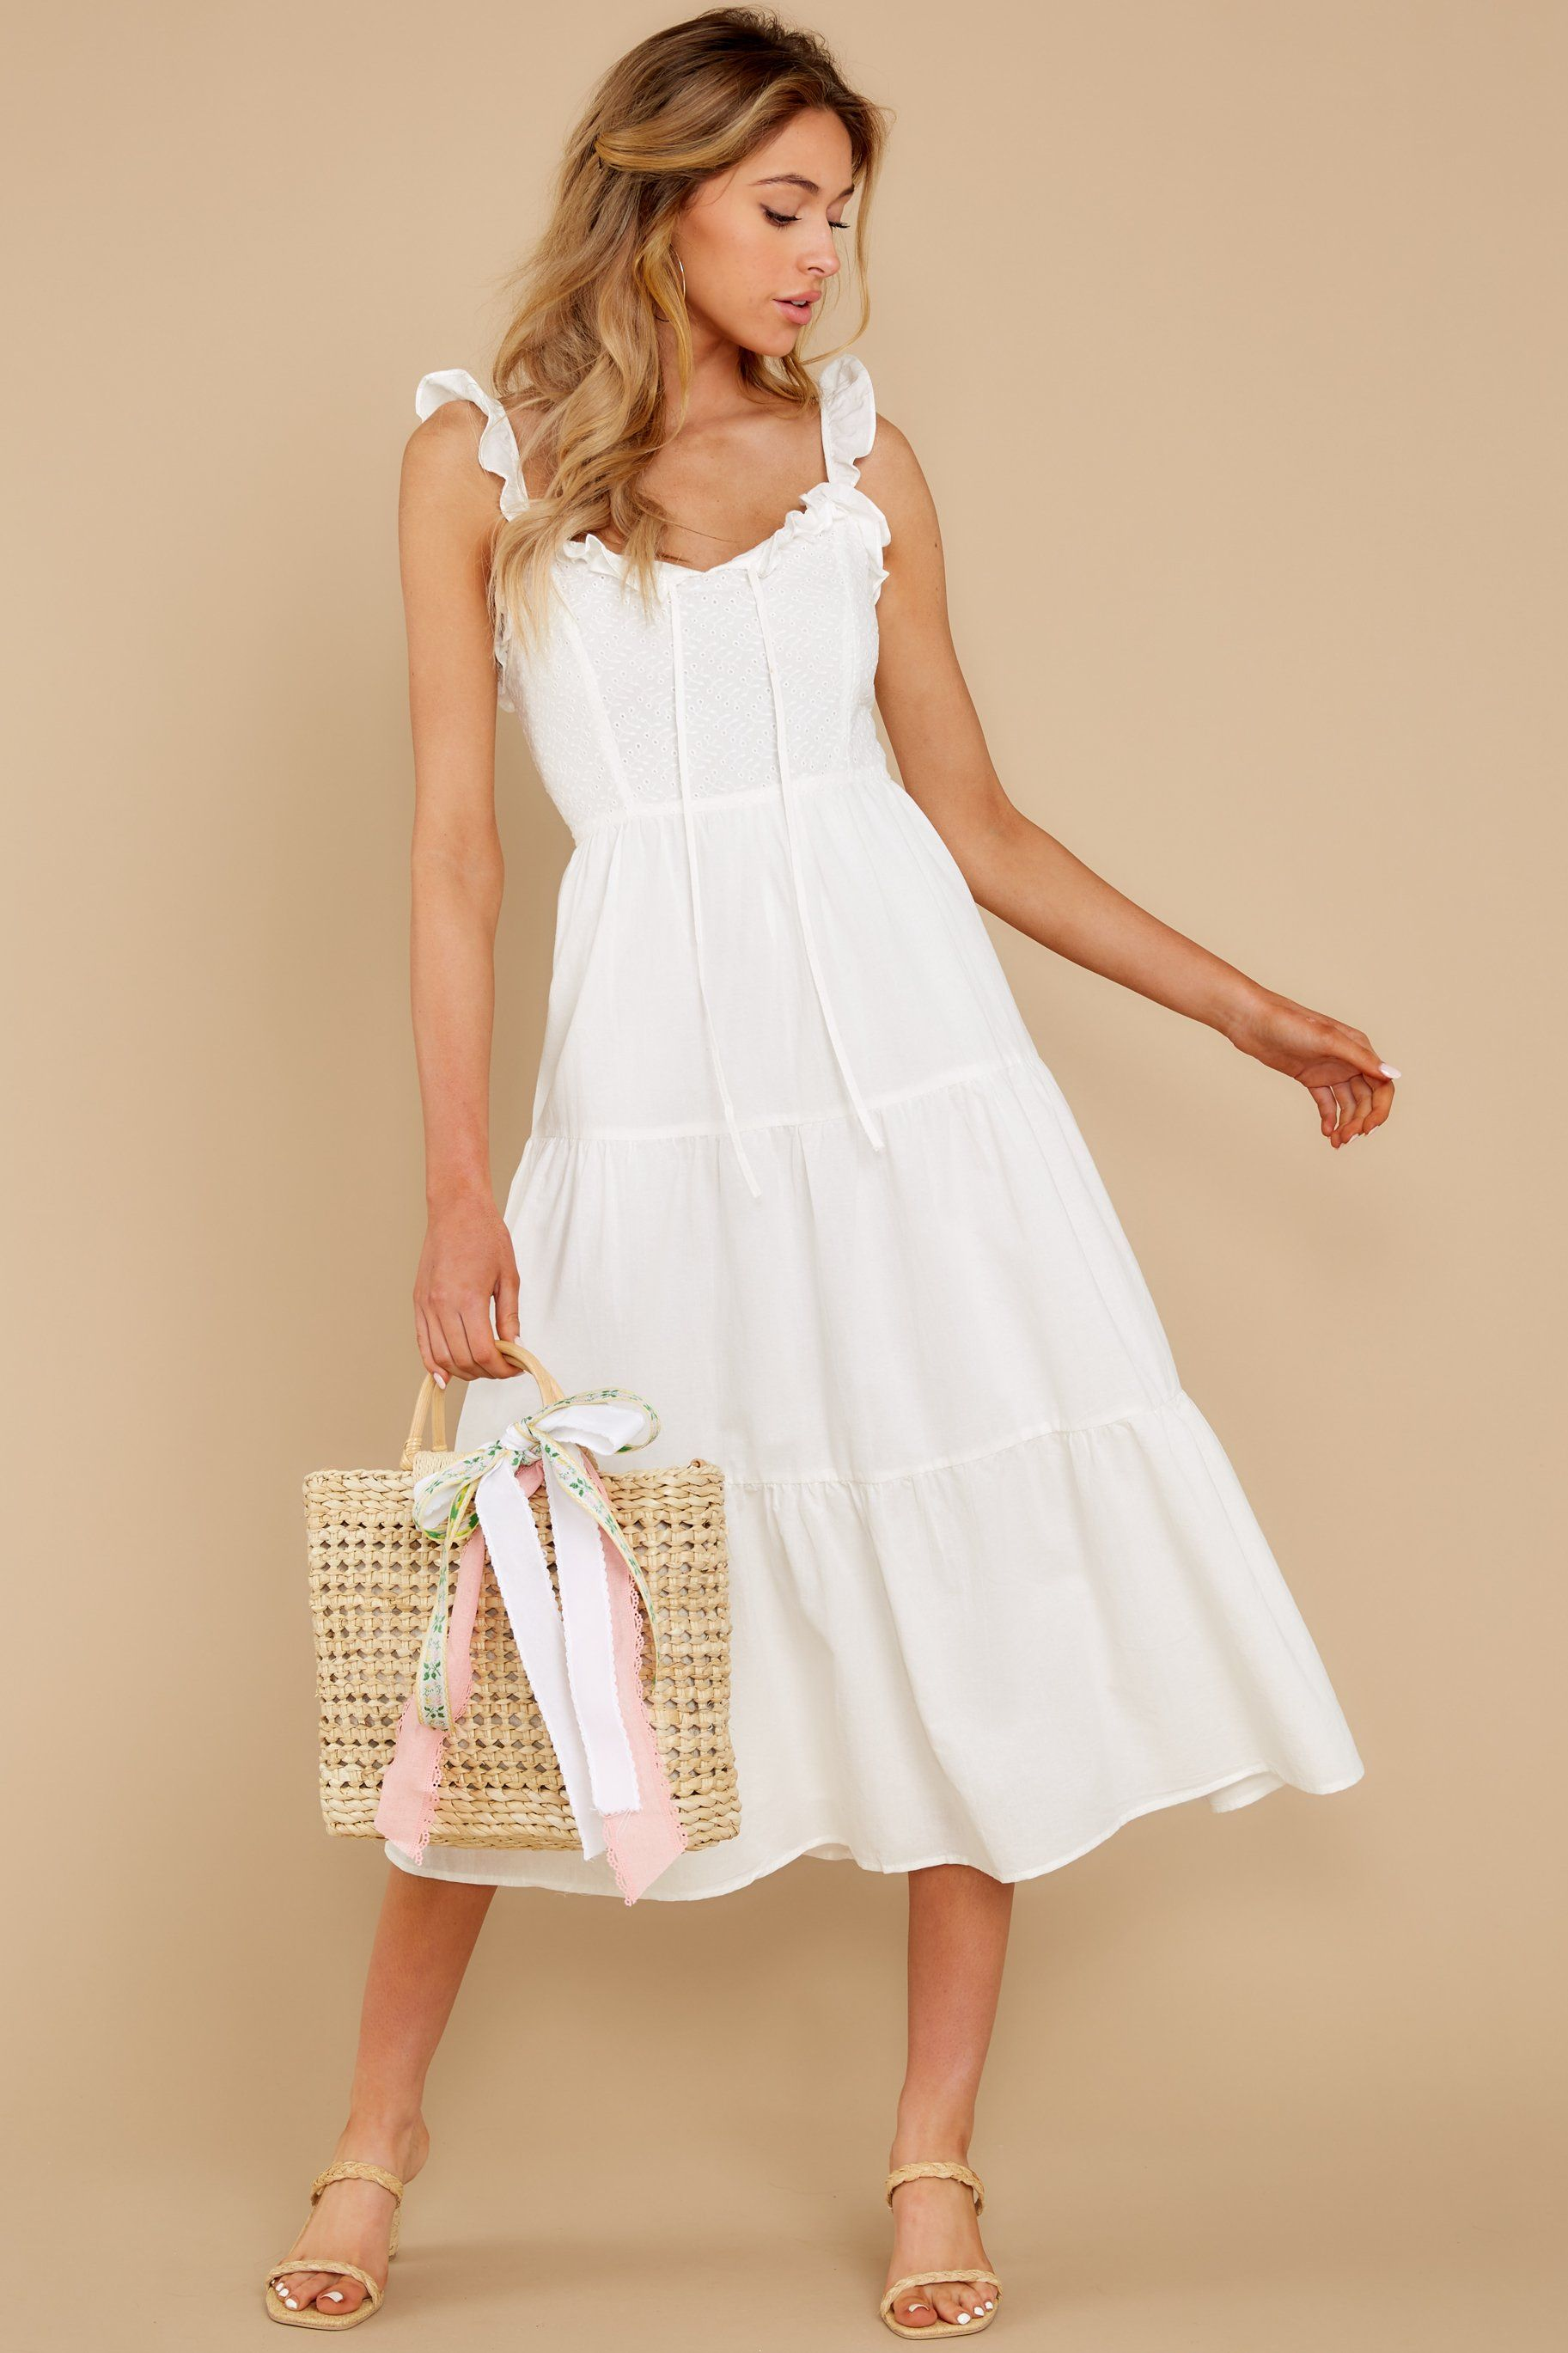 Angelic White Dress Eyelet Detail Ruffle Midi Dress Dresses 48 Midi Dress Red Dress Boutique Dresses [ 2738 x 1825 Pixel ]